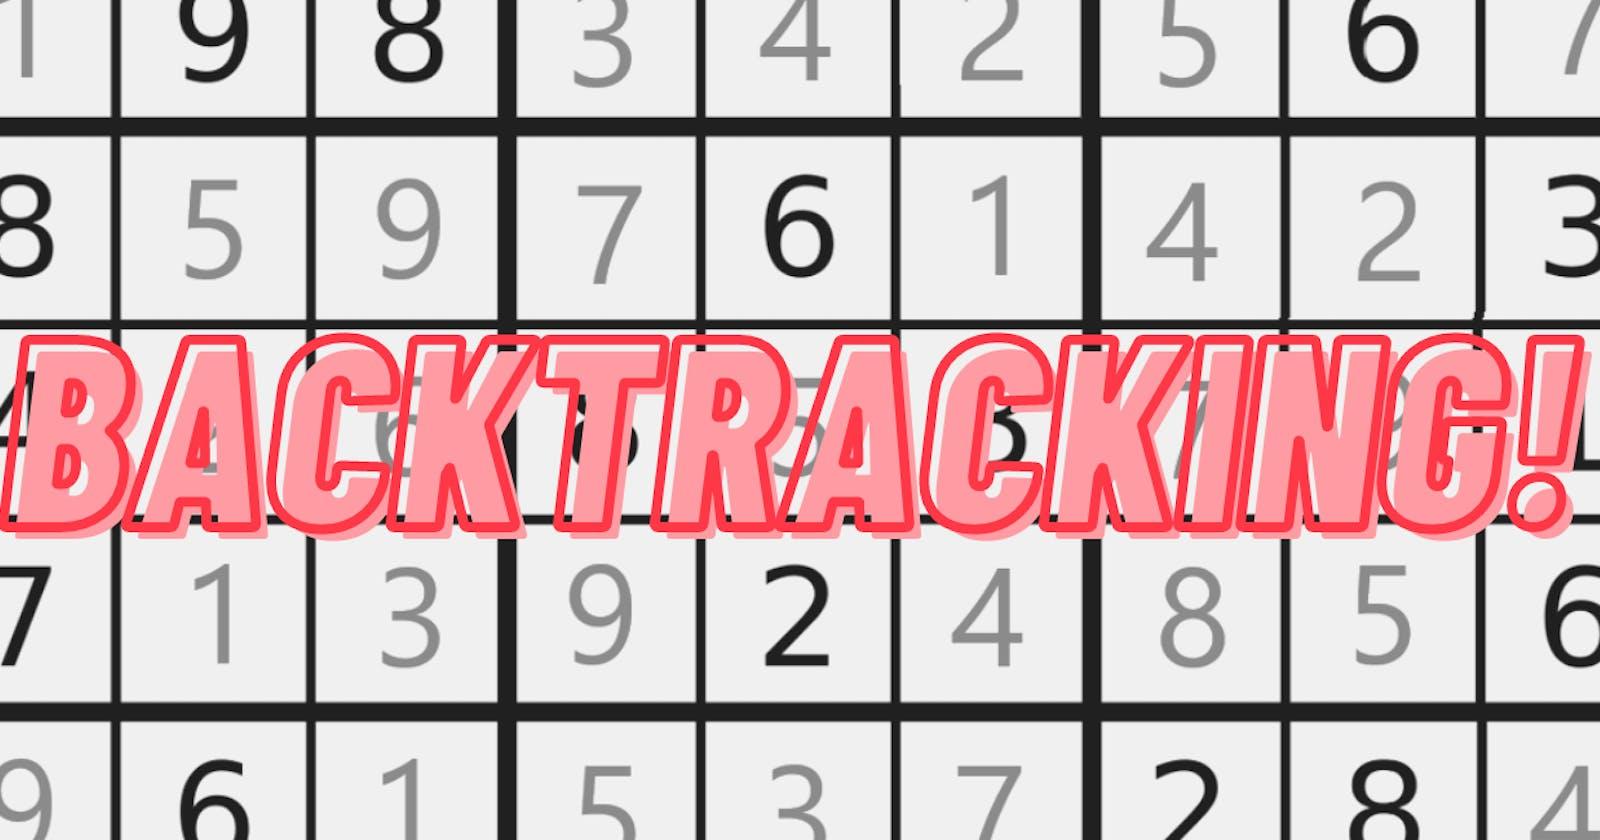 Solving a Sudoku board using BackTracking.